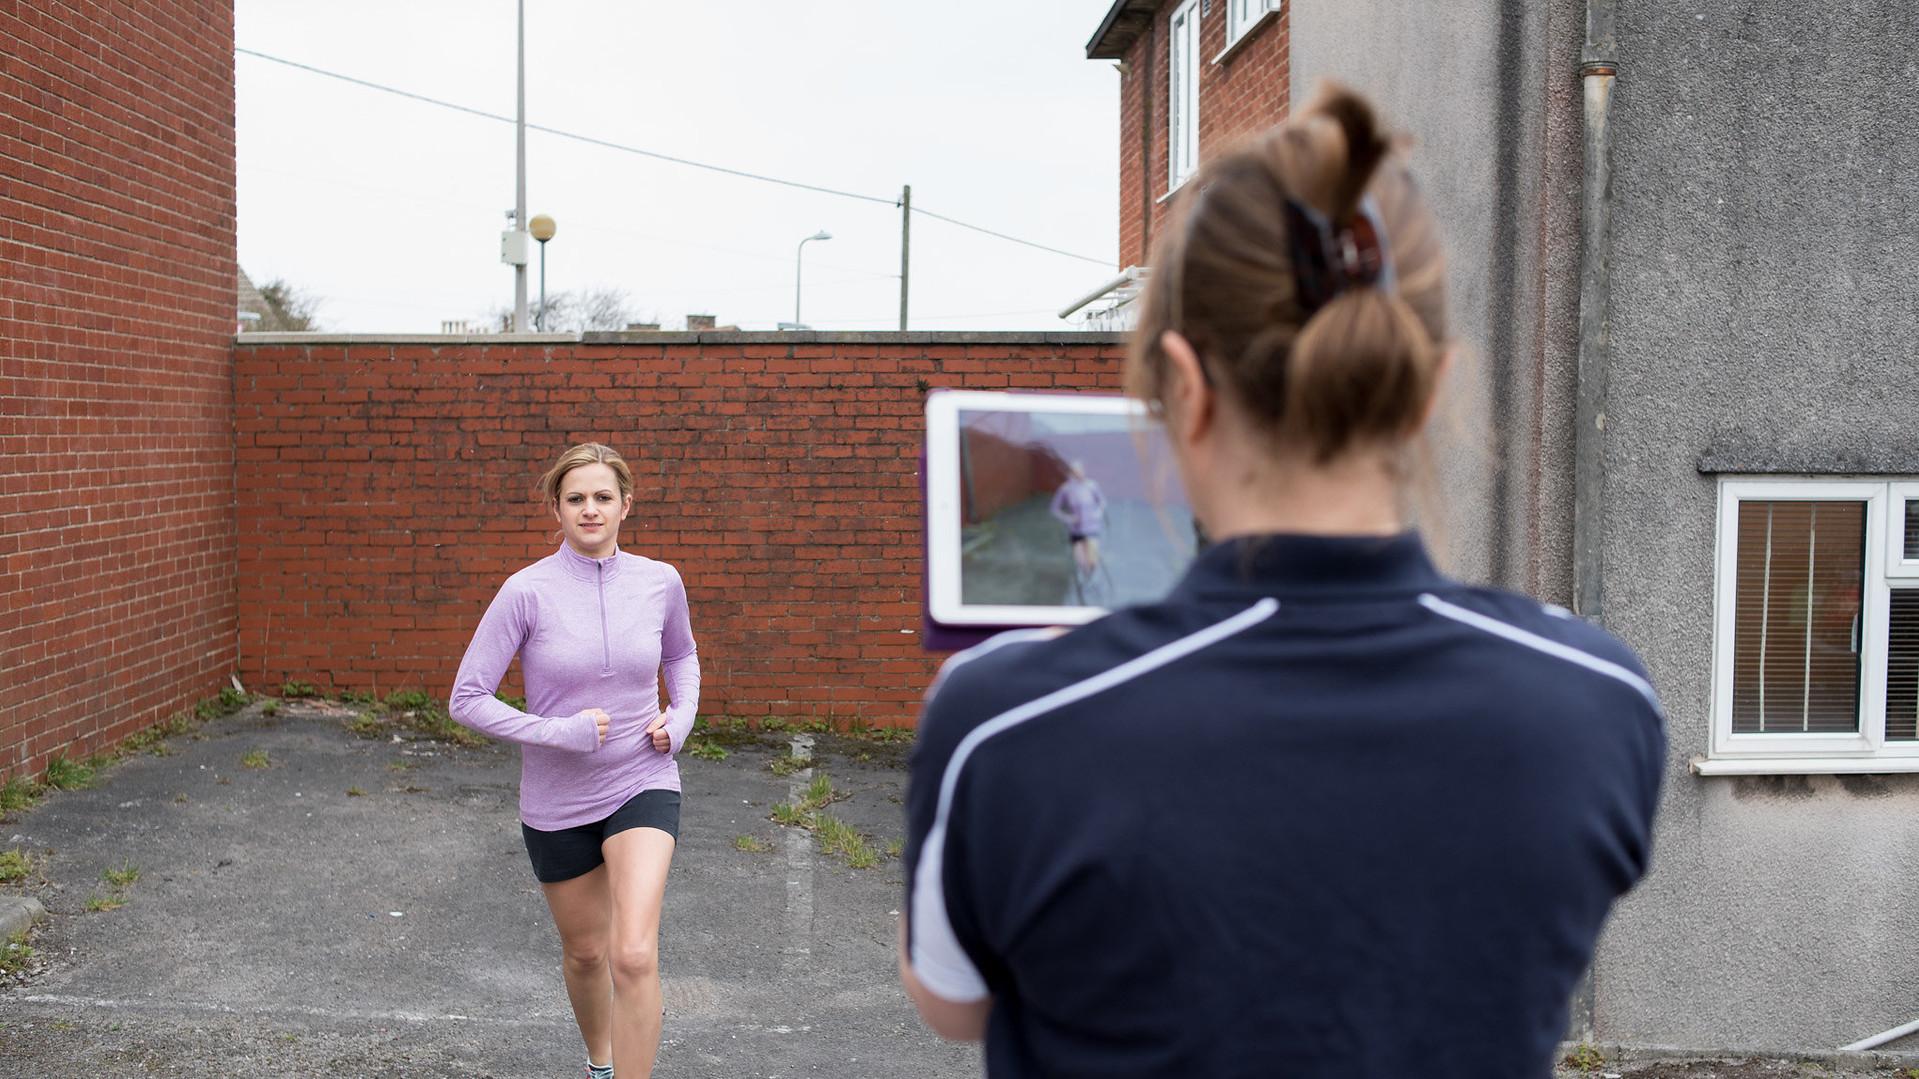 Running Gait Analysis at The Reinge Clinic, Kenilworth / Portishead